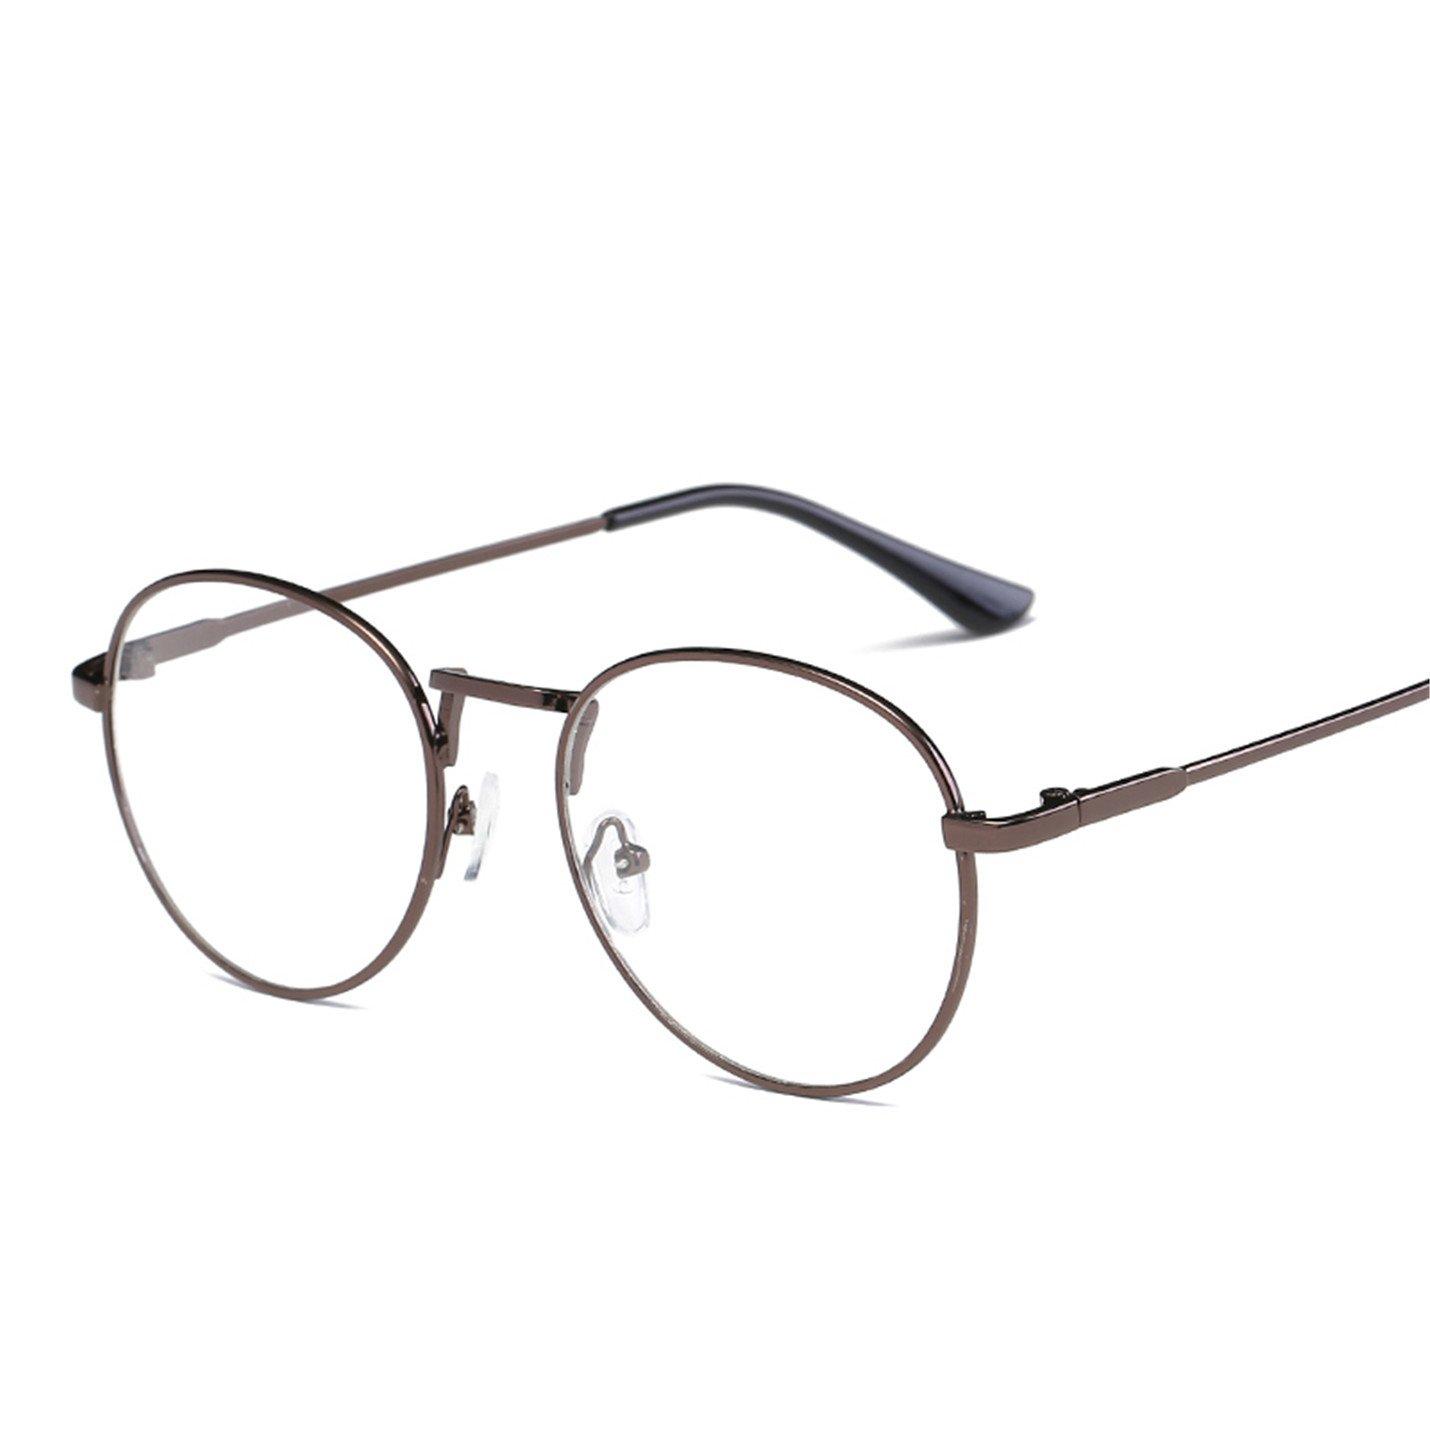 Amazon.com: Vintage Round Glasses frame retro Female Brand ...